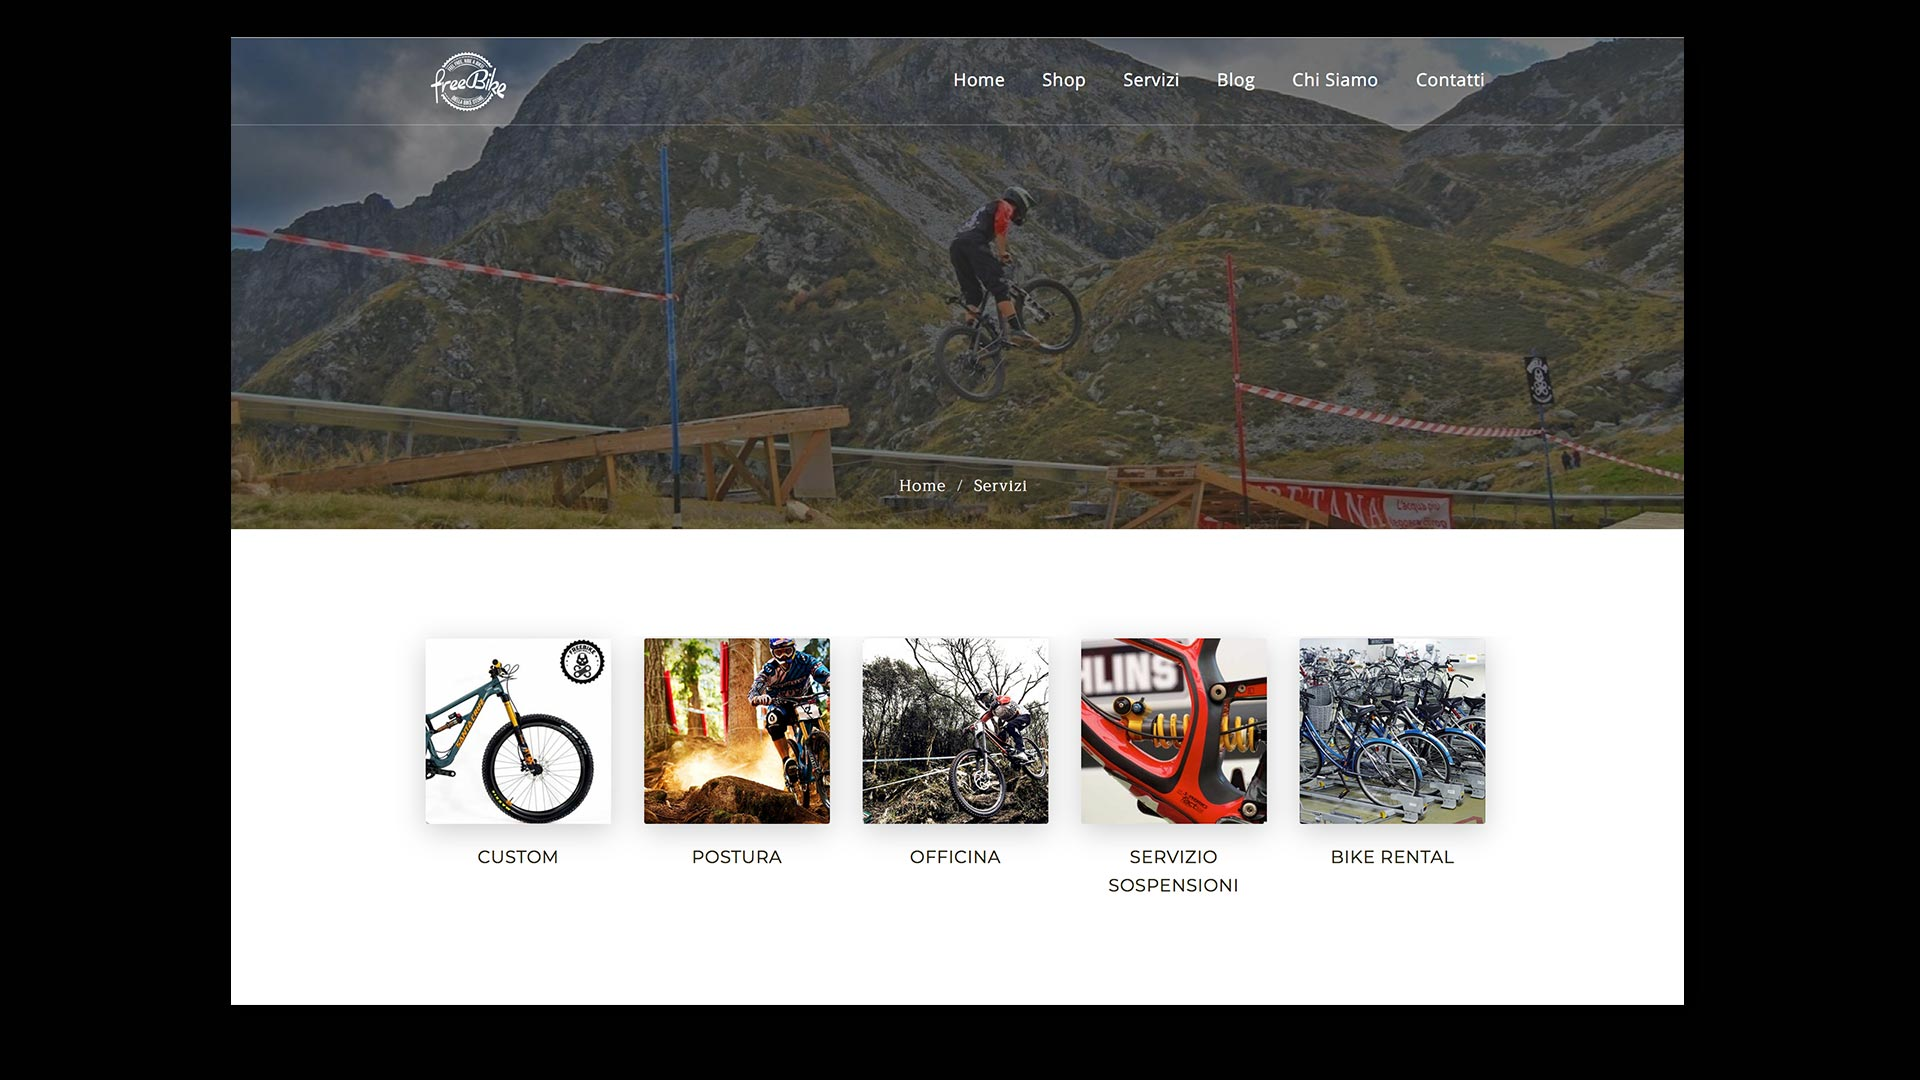 Sito Web Free Bike - OrangePix